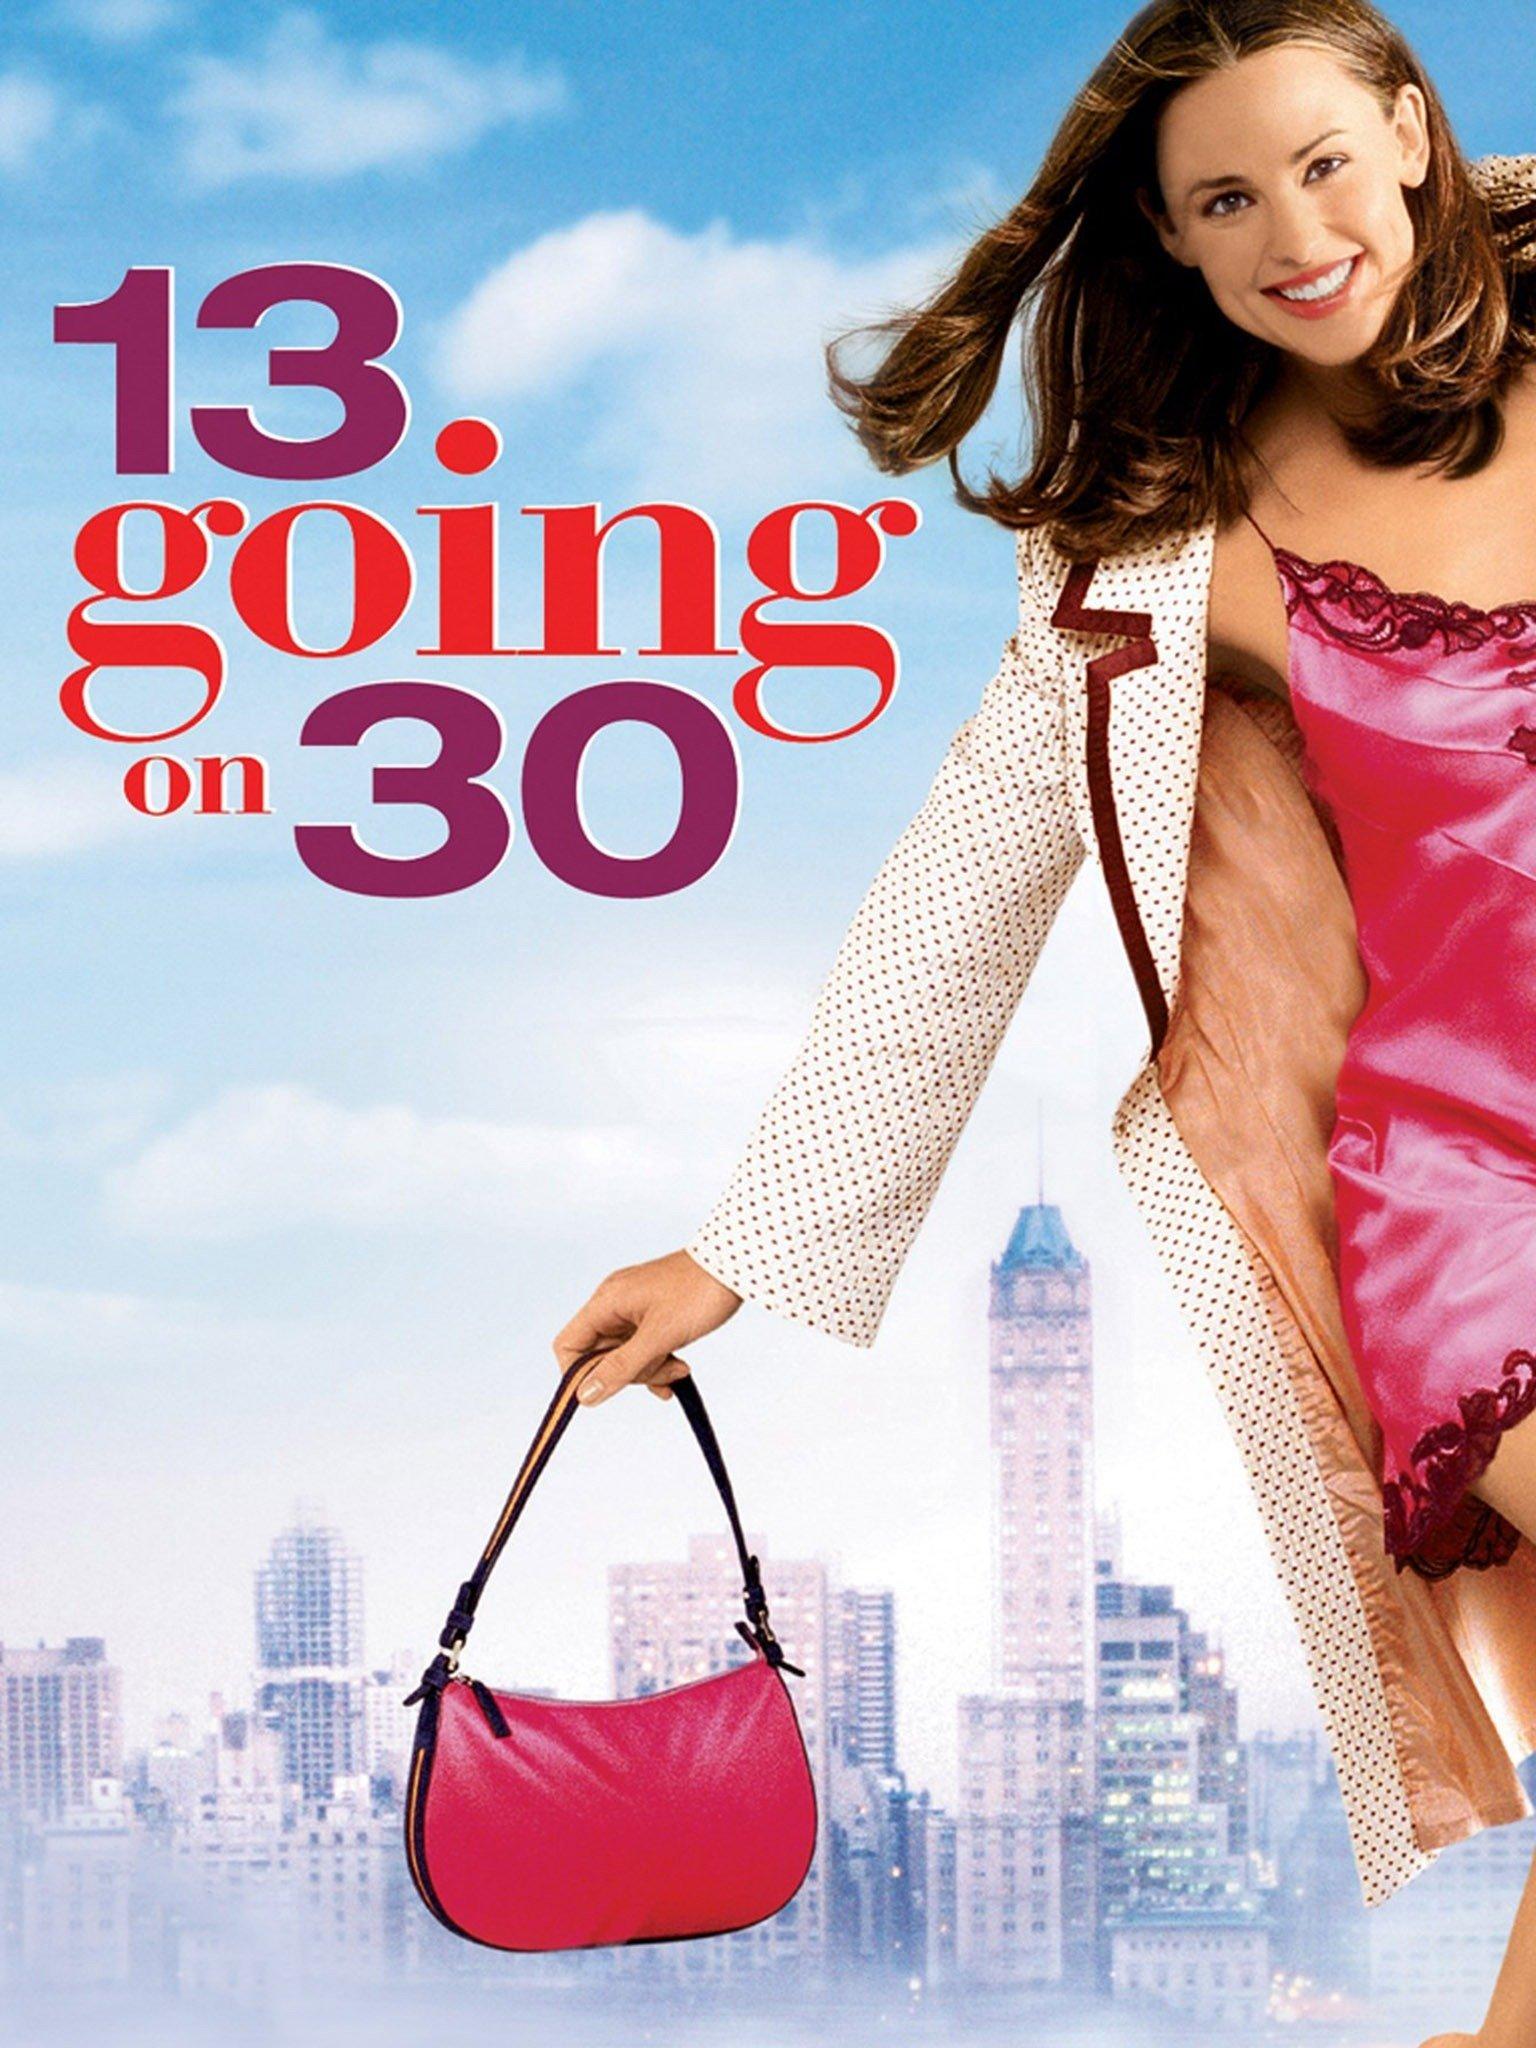 13 going on 30 favorite fashion film